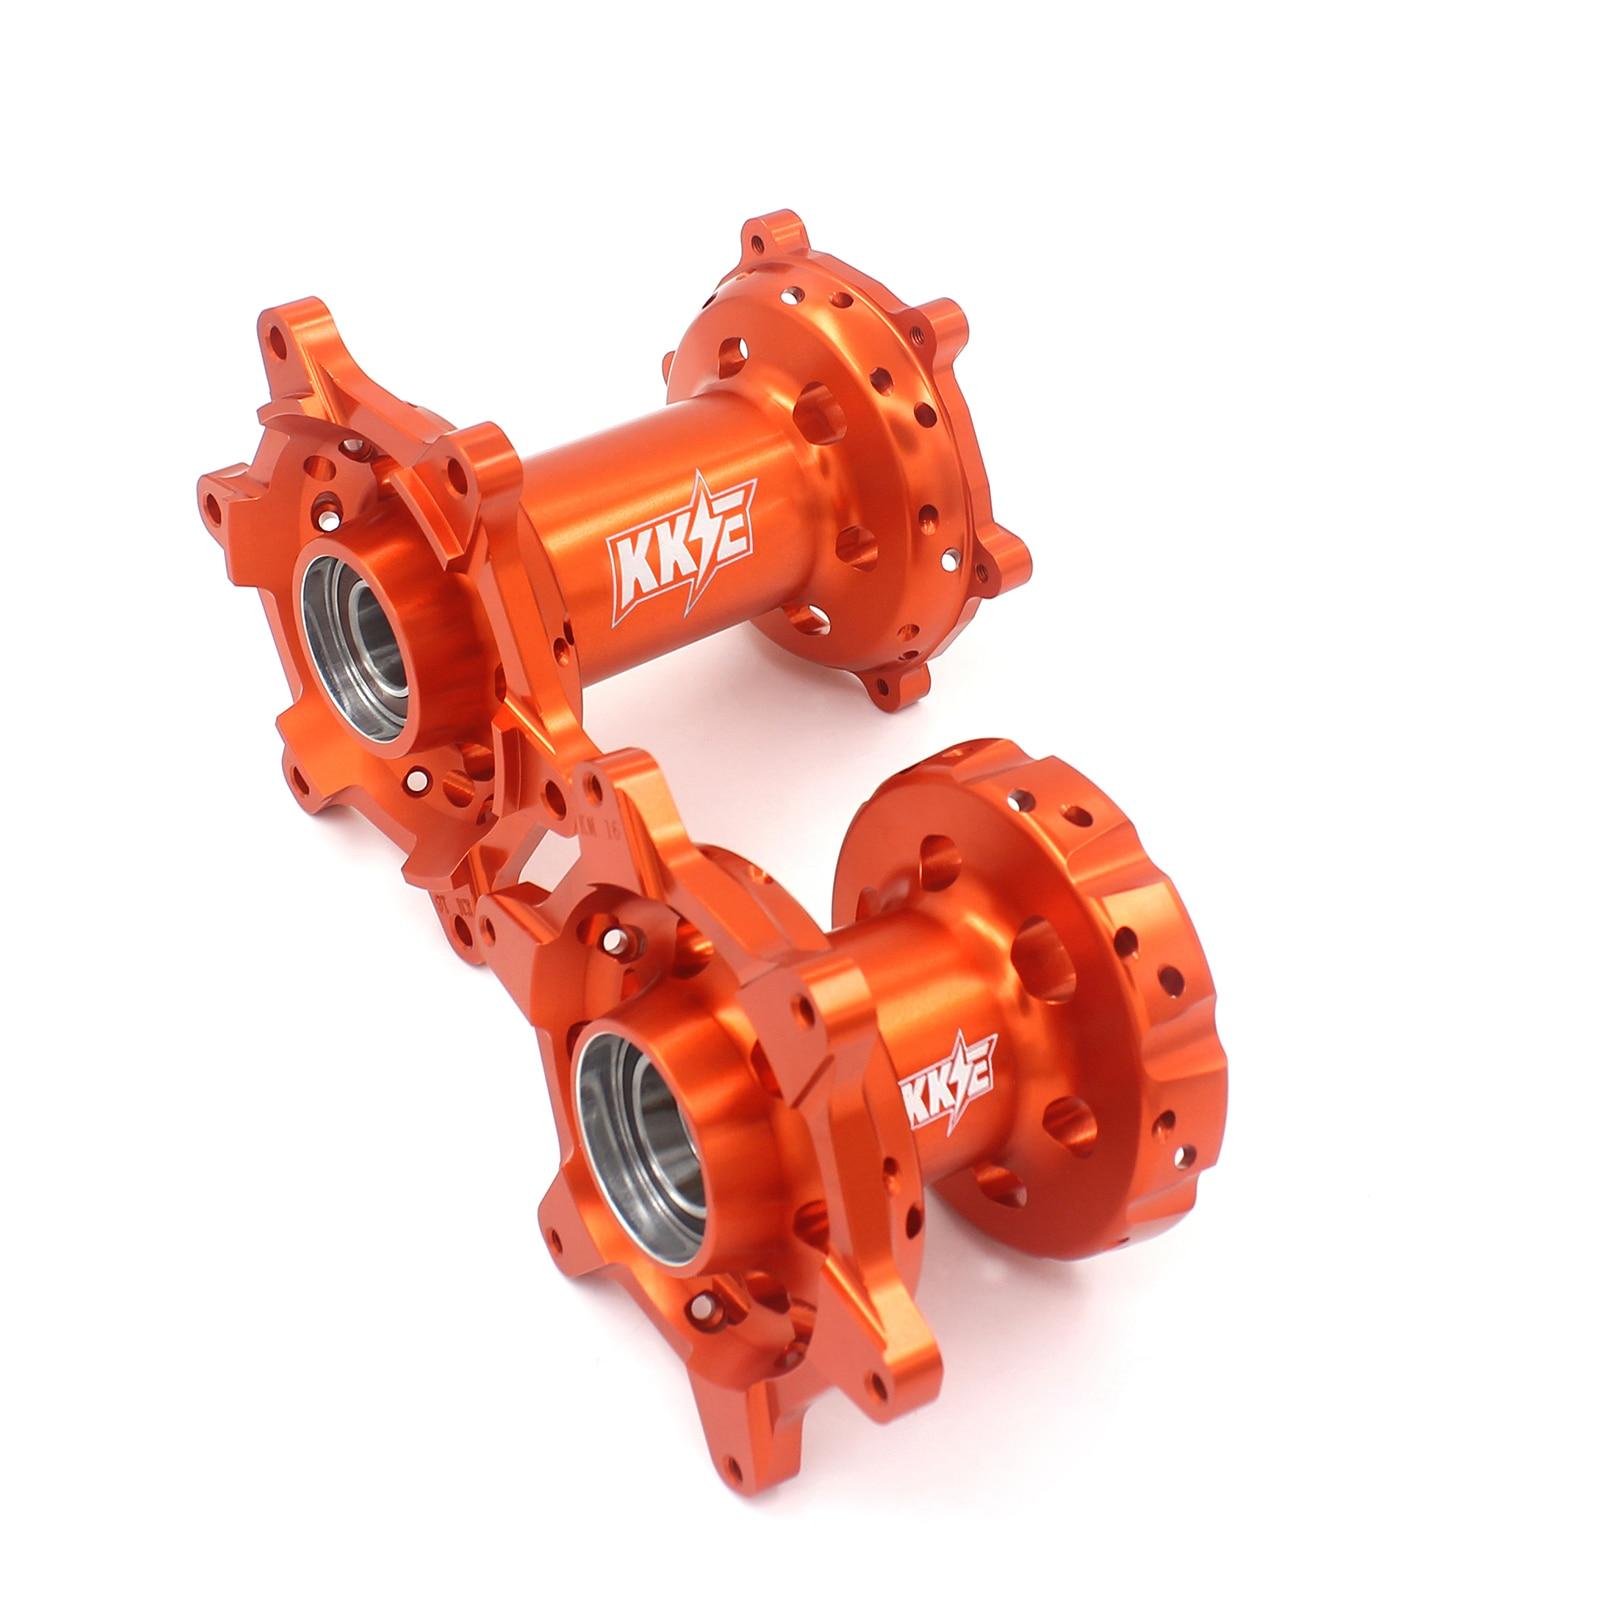 Motorcycle Aluminium Alloy CNC Machined Hub Set Compatible with KTM EXC 125 SXF 350 XC-F 450 Orange or Blue